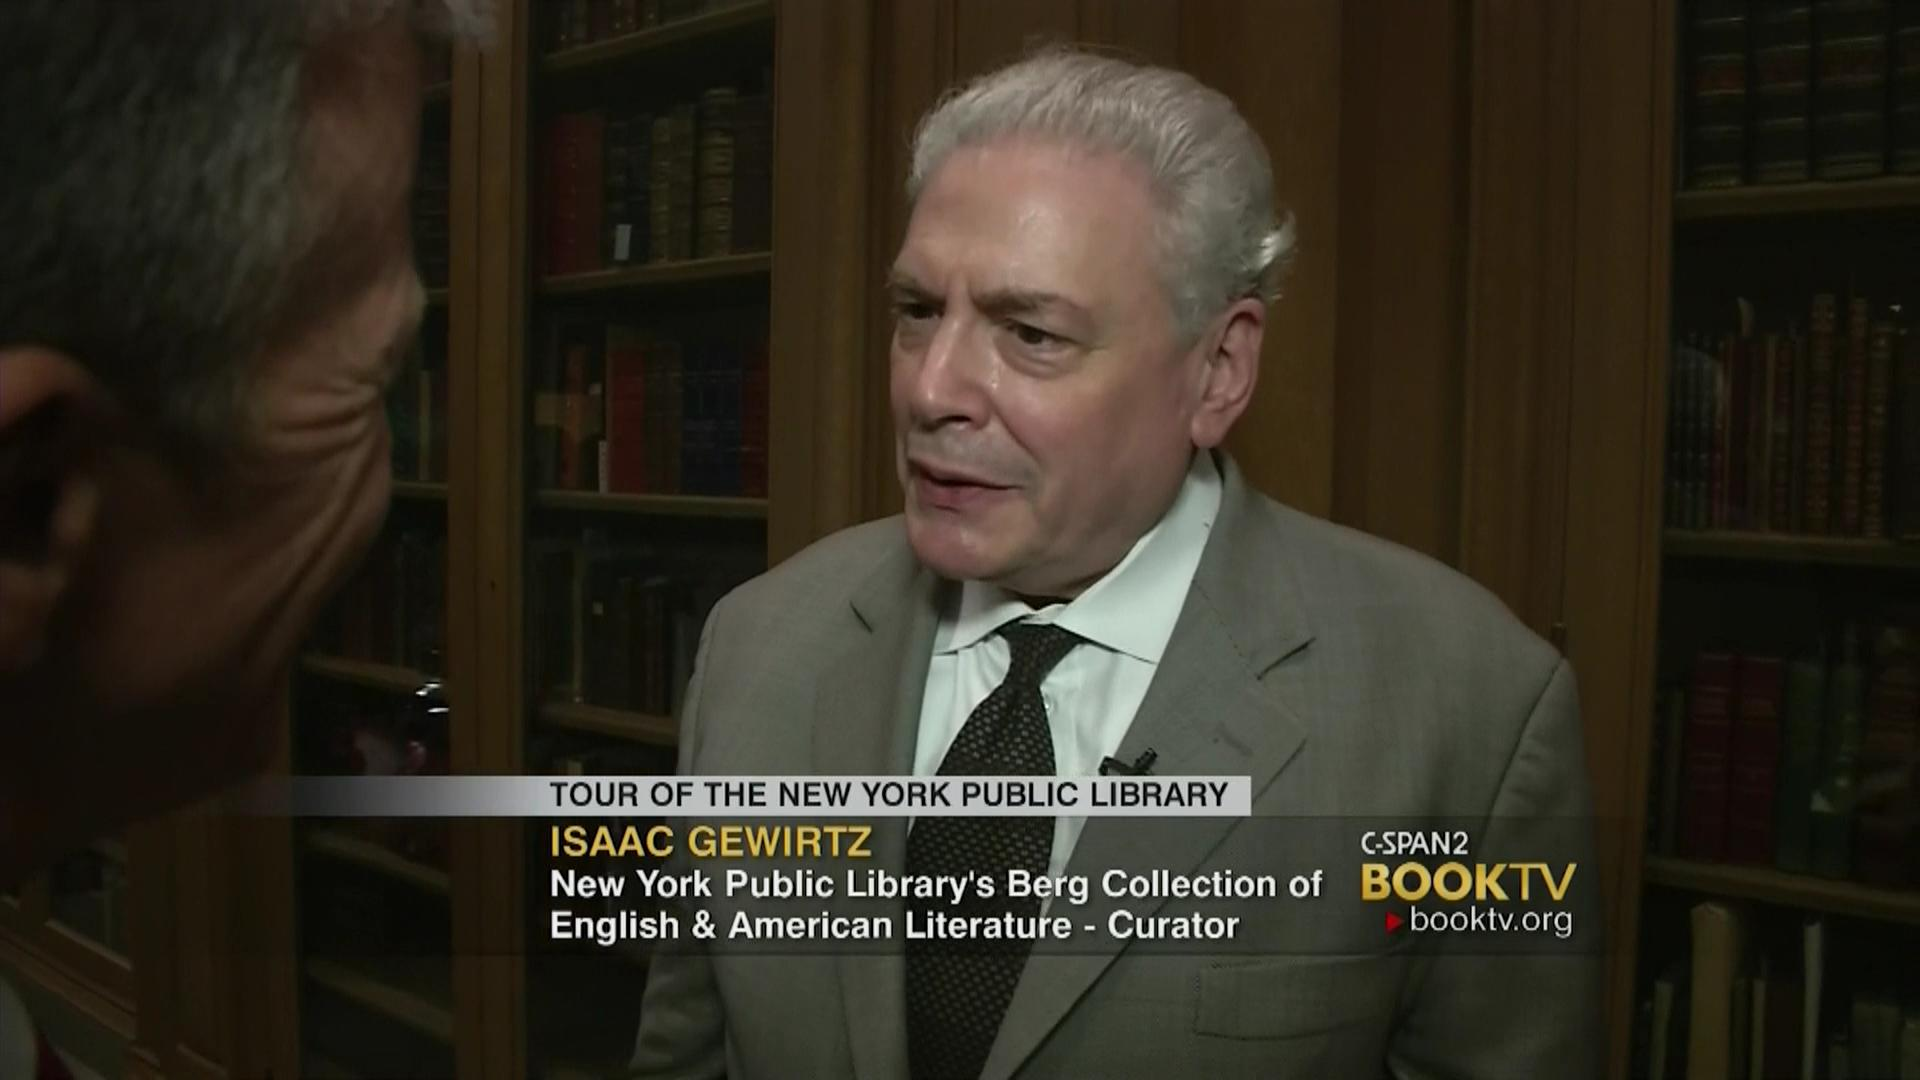 Interview Jonathan Yardley Dec 16 2014 Video